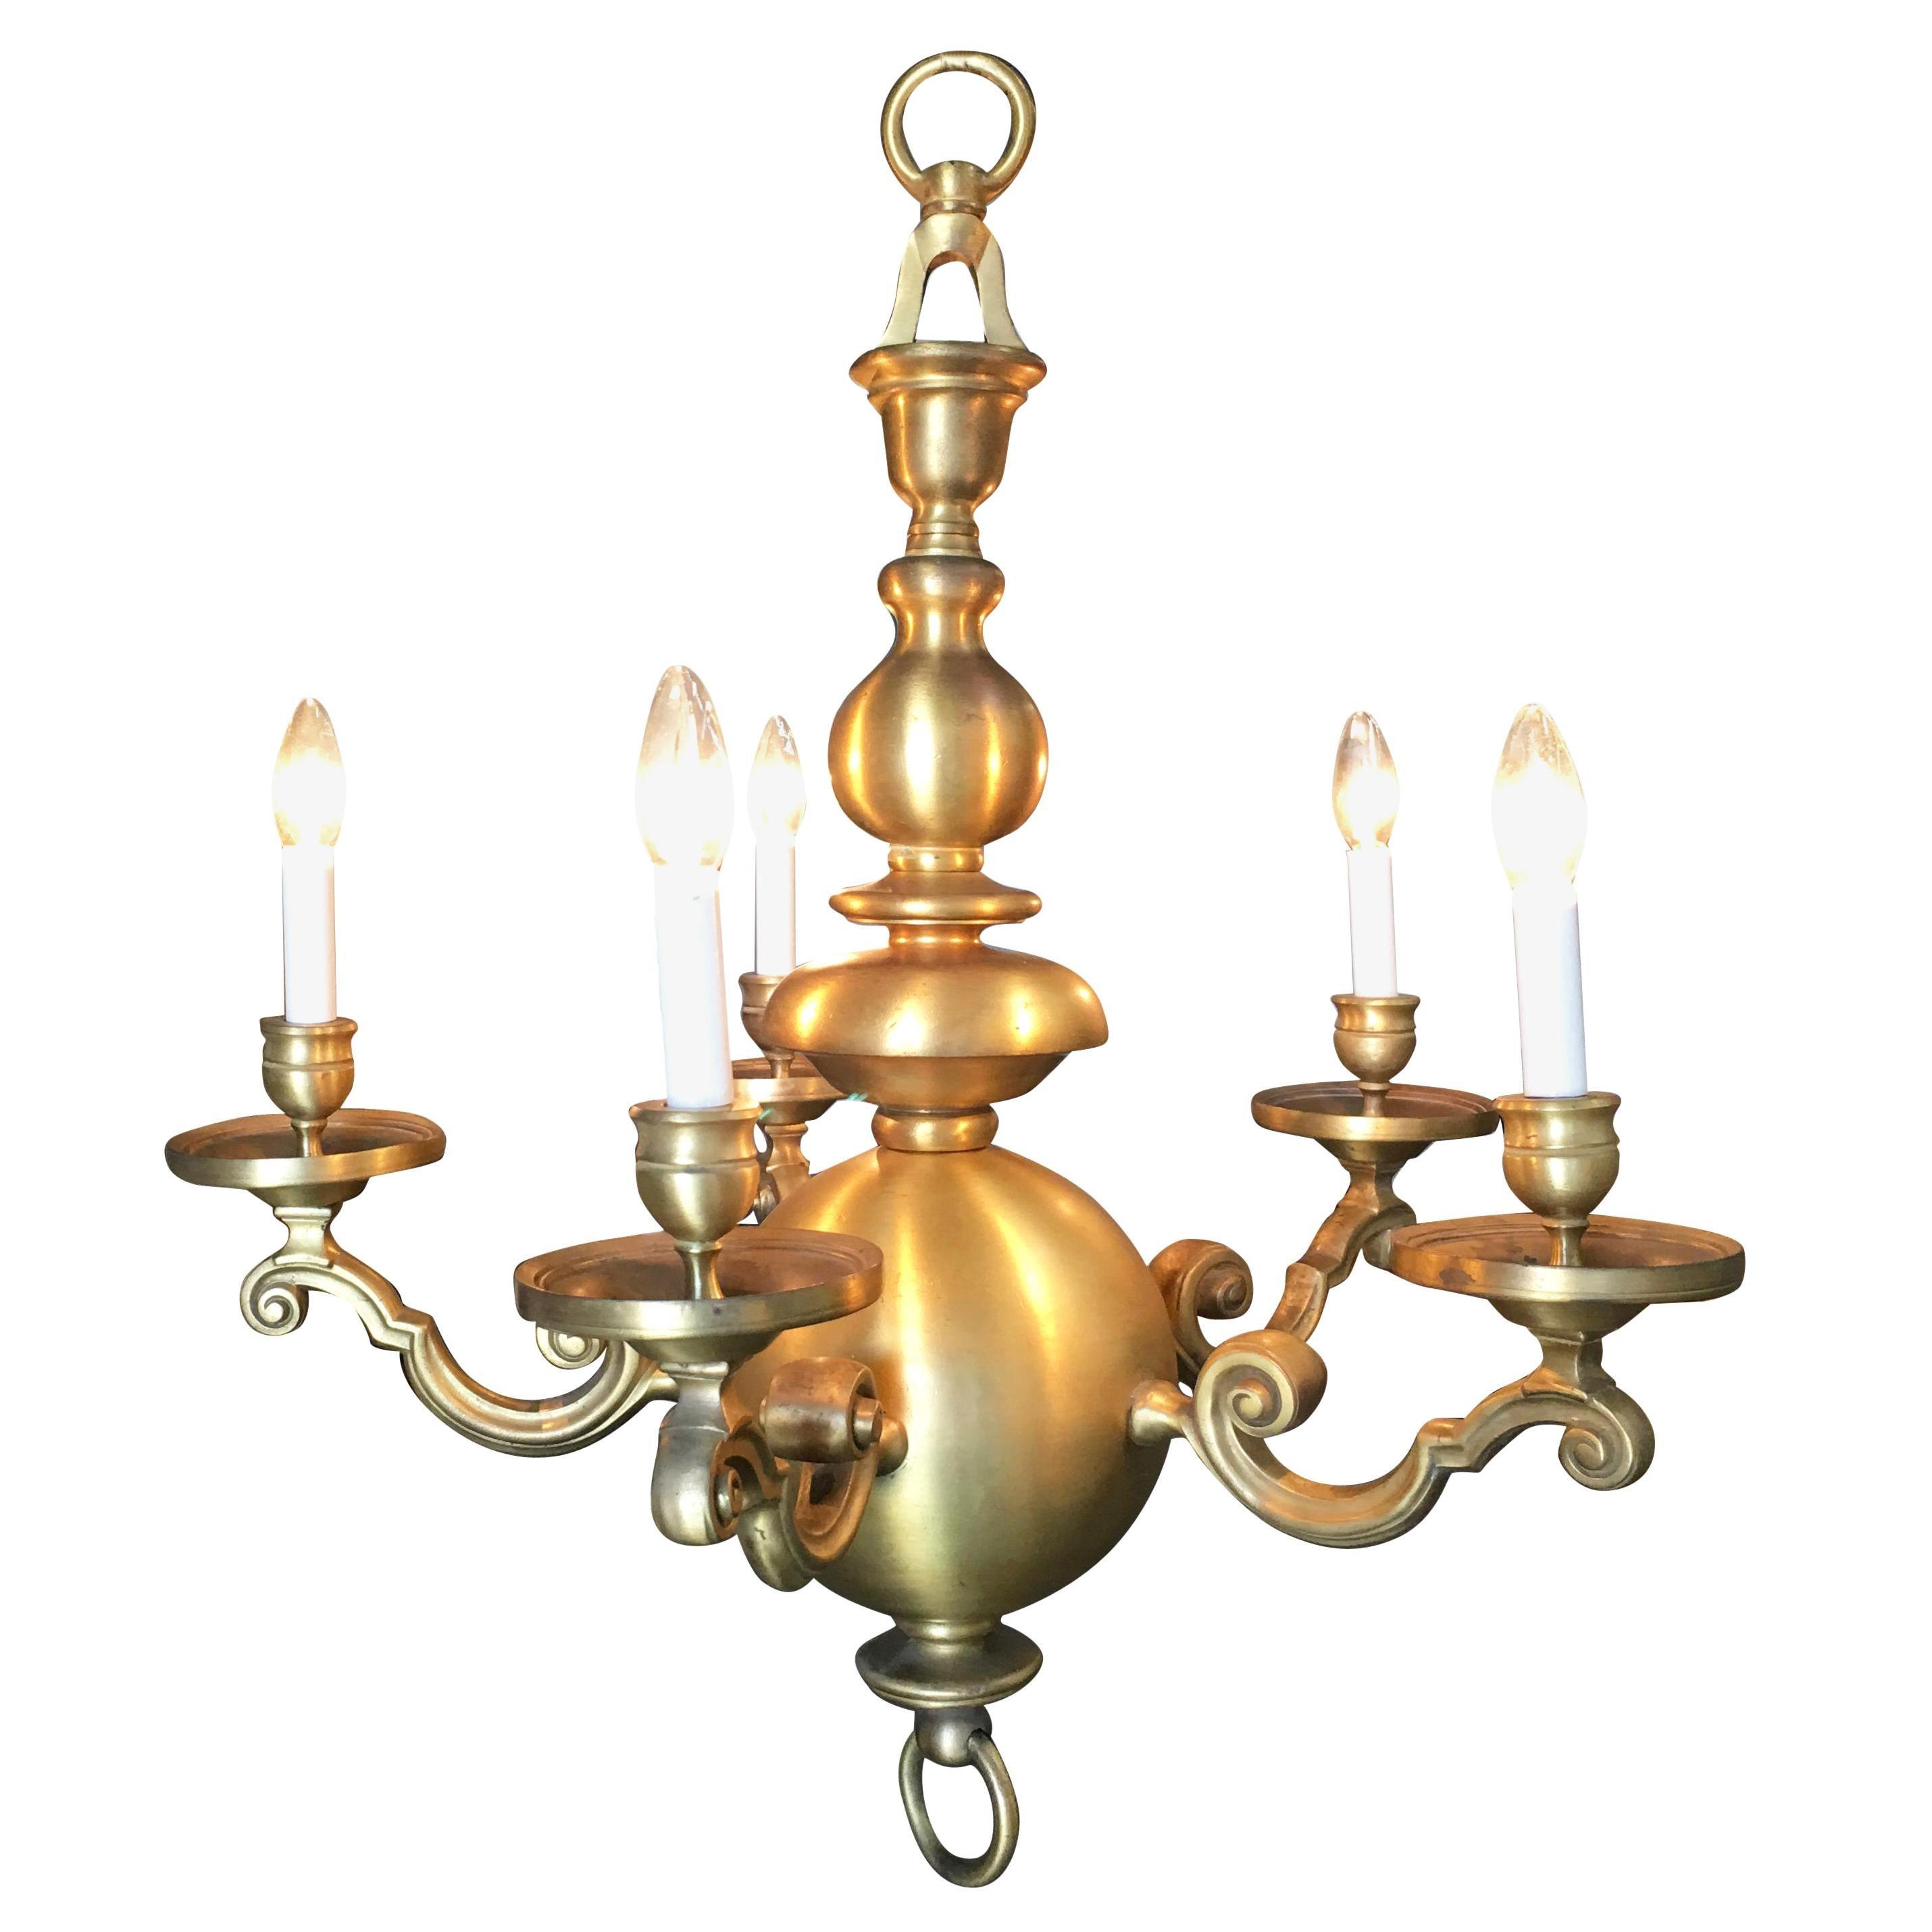 English Georgian Style Solid Brass 5-Arm Chandelier